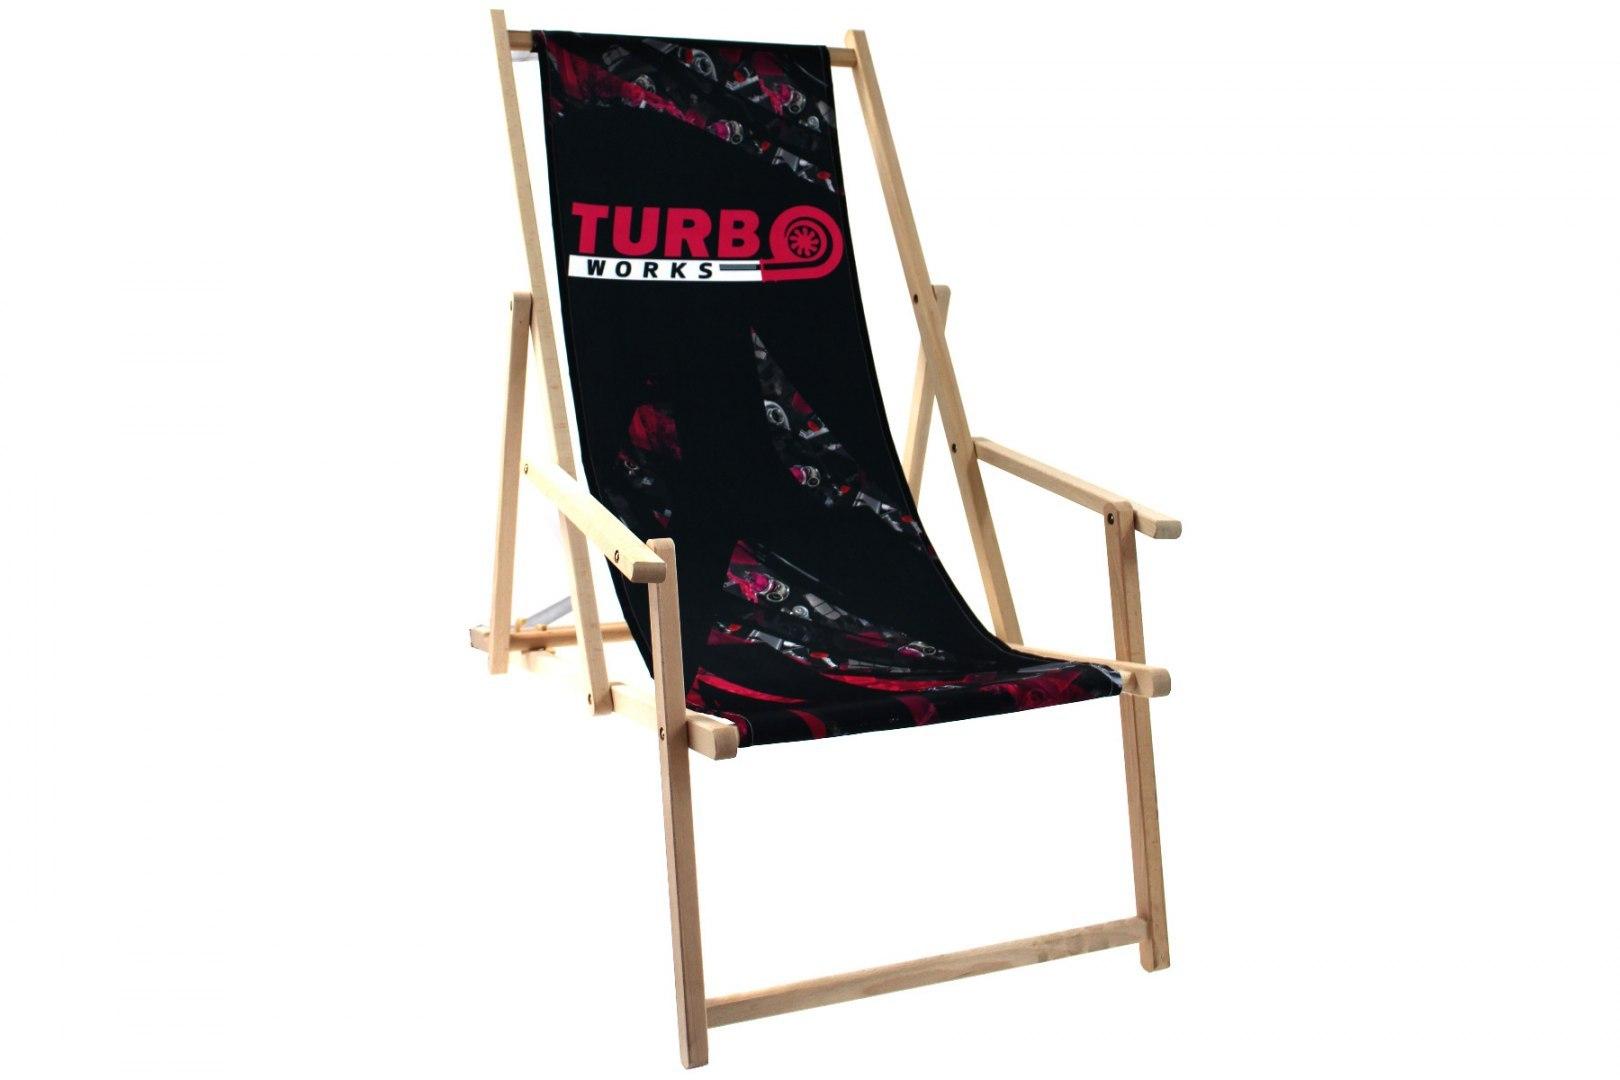 Leżak TurboWorks - GRUBYGARAGE - Sklep Tuningowy